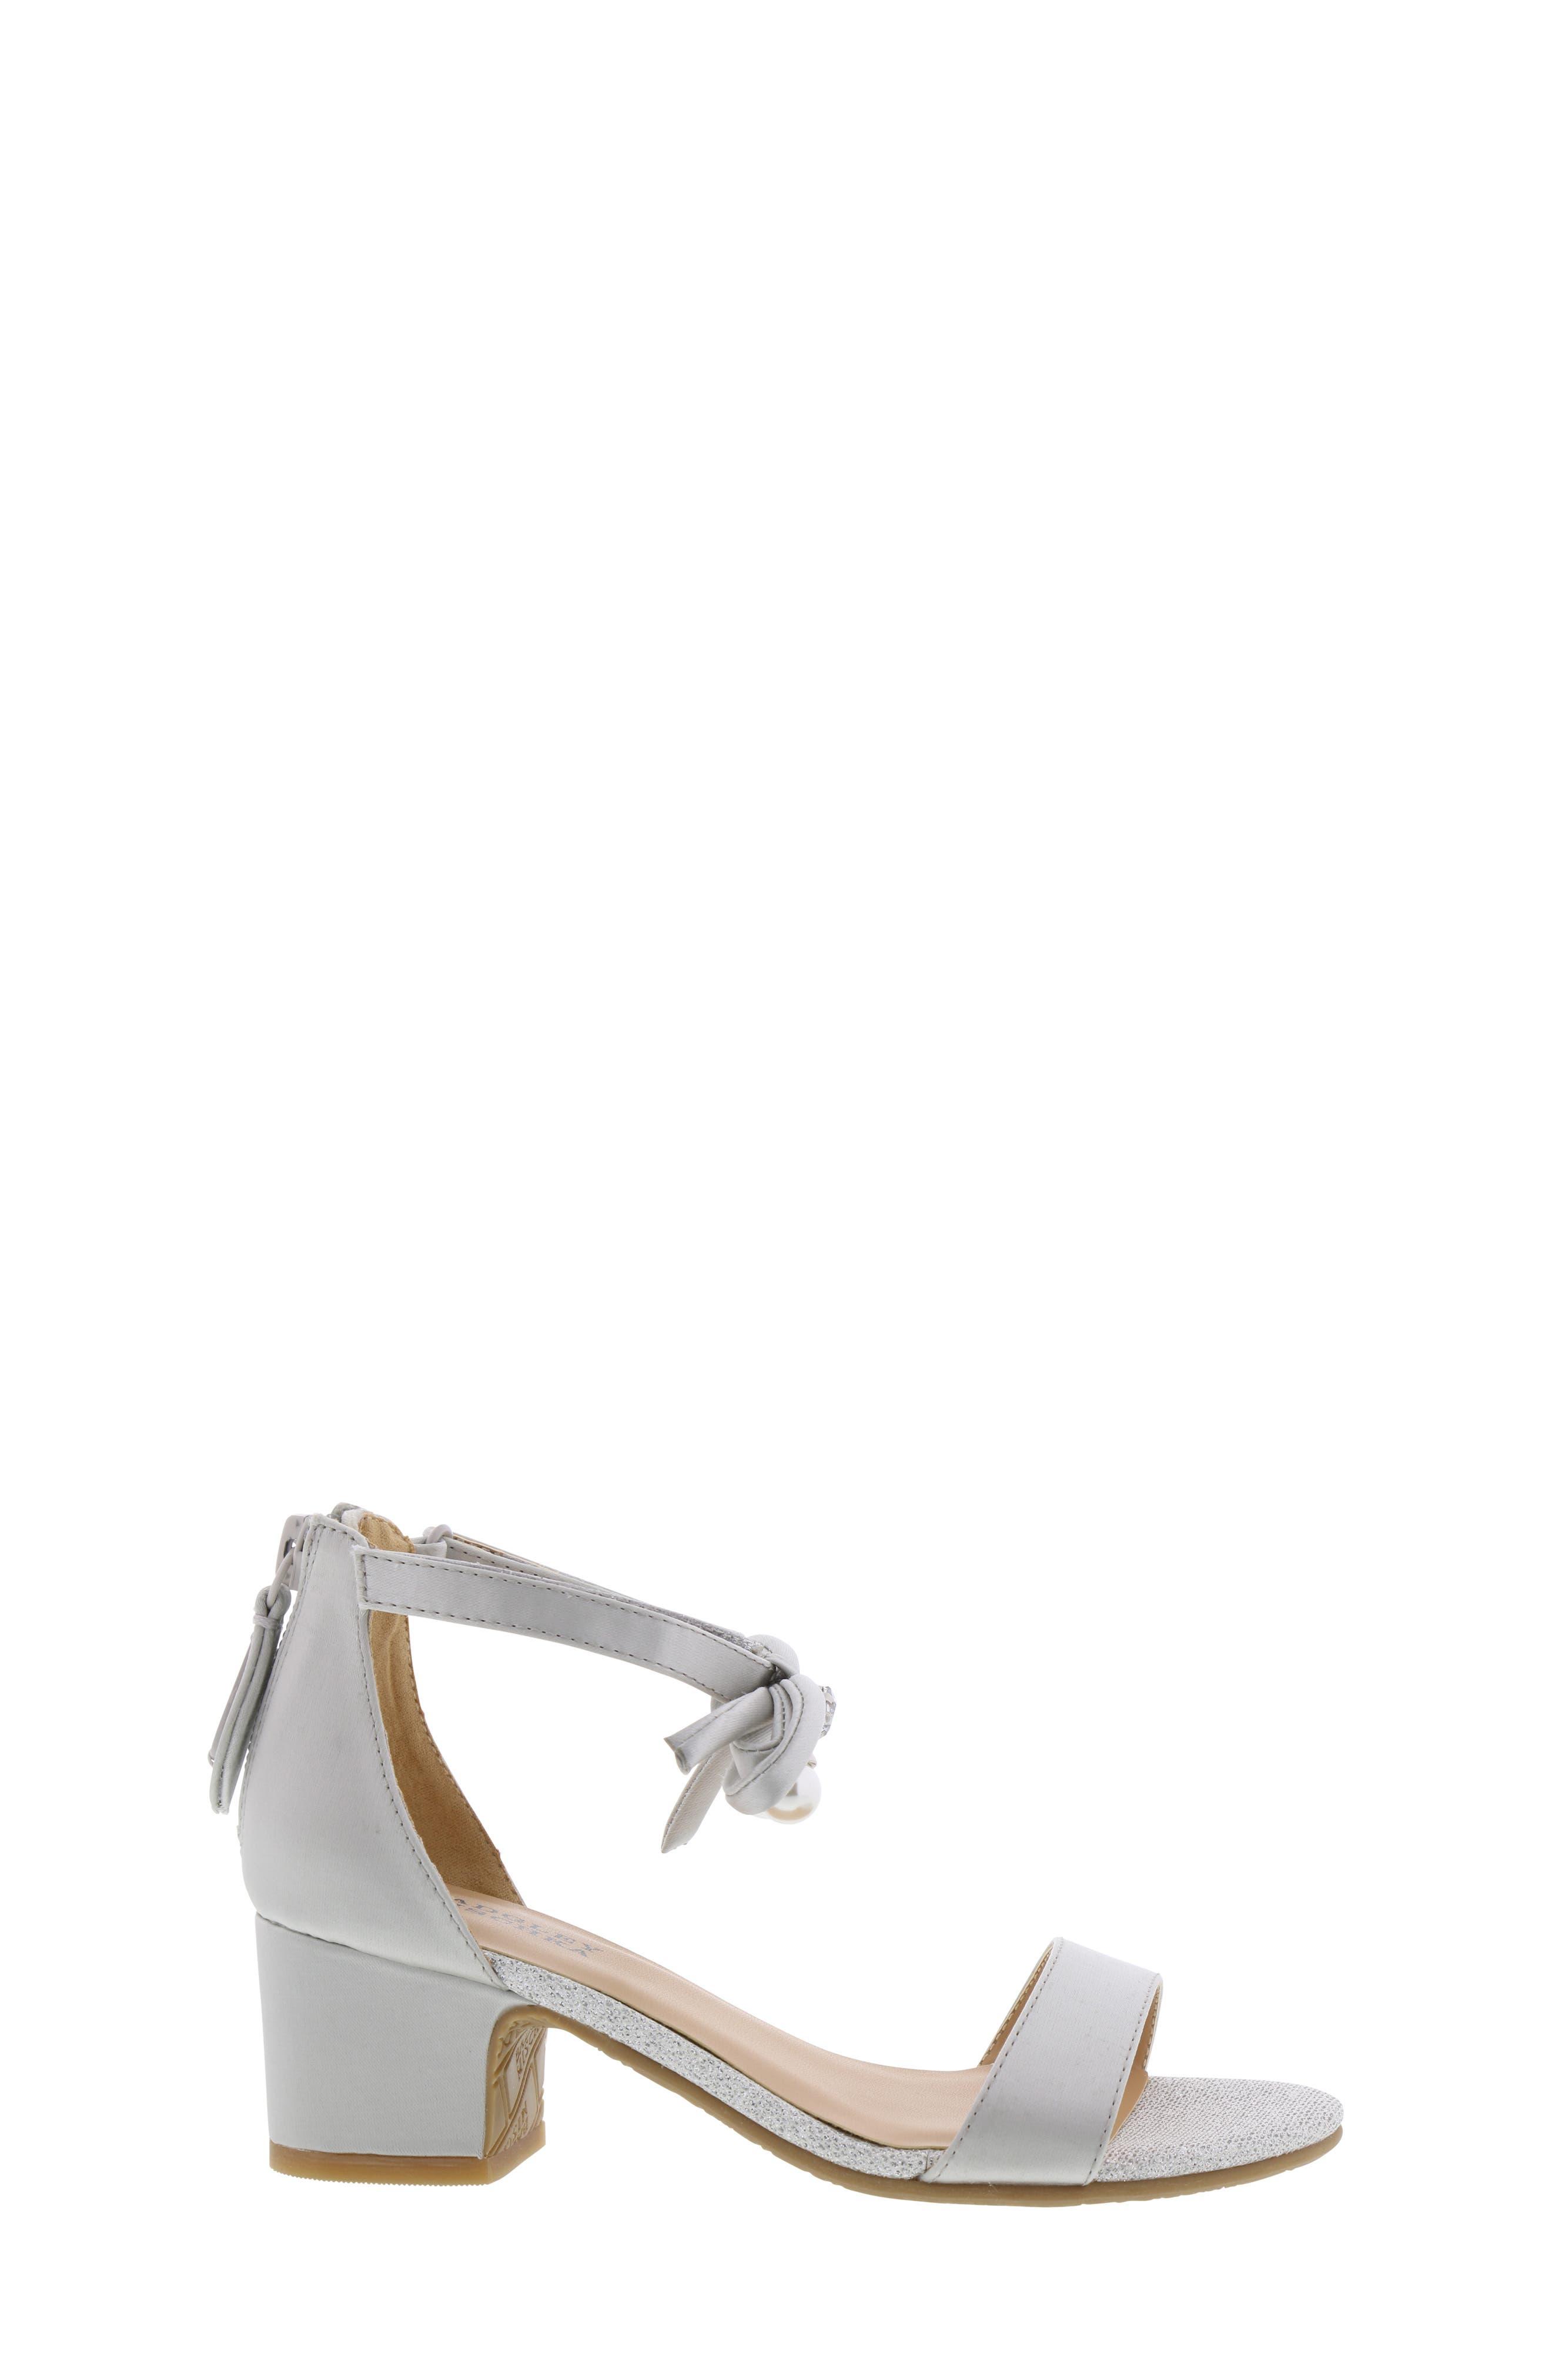 BADGLEY MISCHKA COLLECTION, Badgley Mischka Pernia Embellished Bow Sandal, Alternate thumbnail 3, color, SILVER